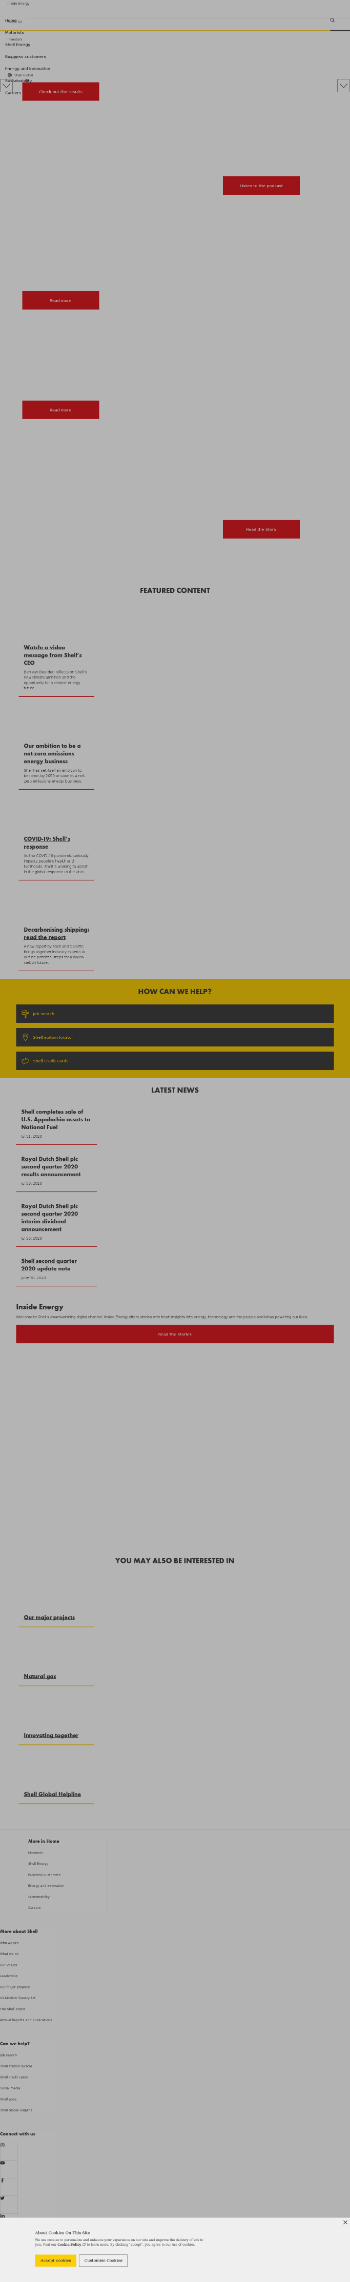 Royal Dutch Shell plc Website Screenshot